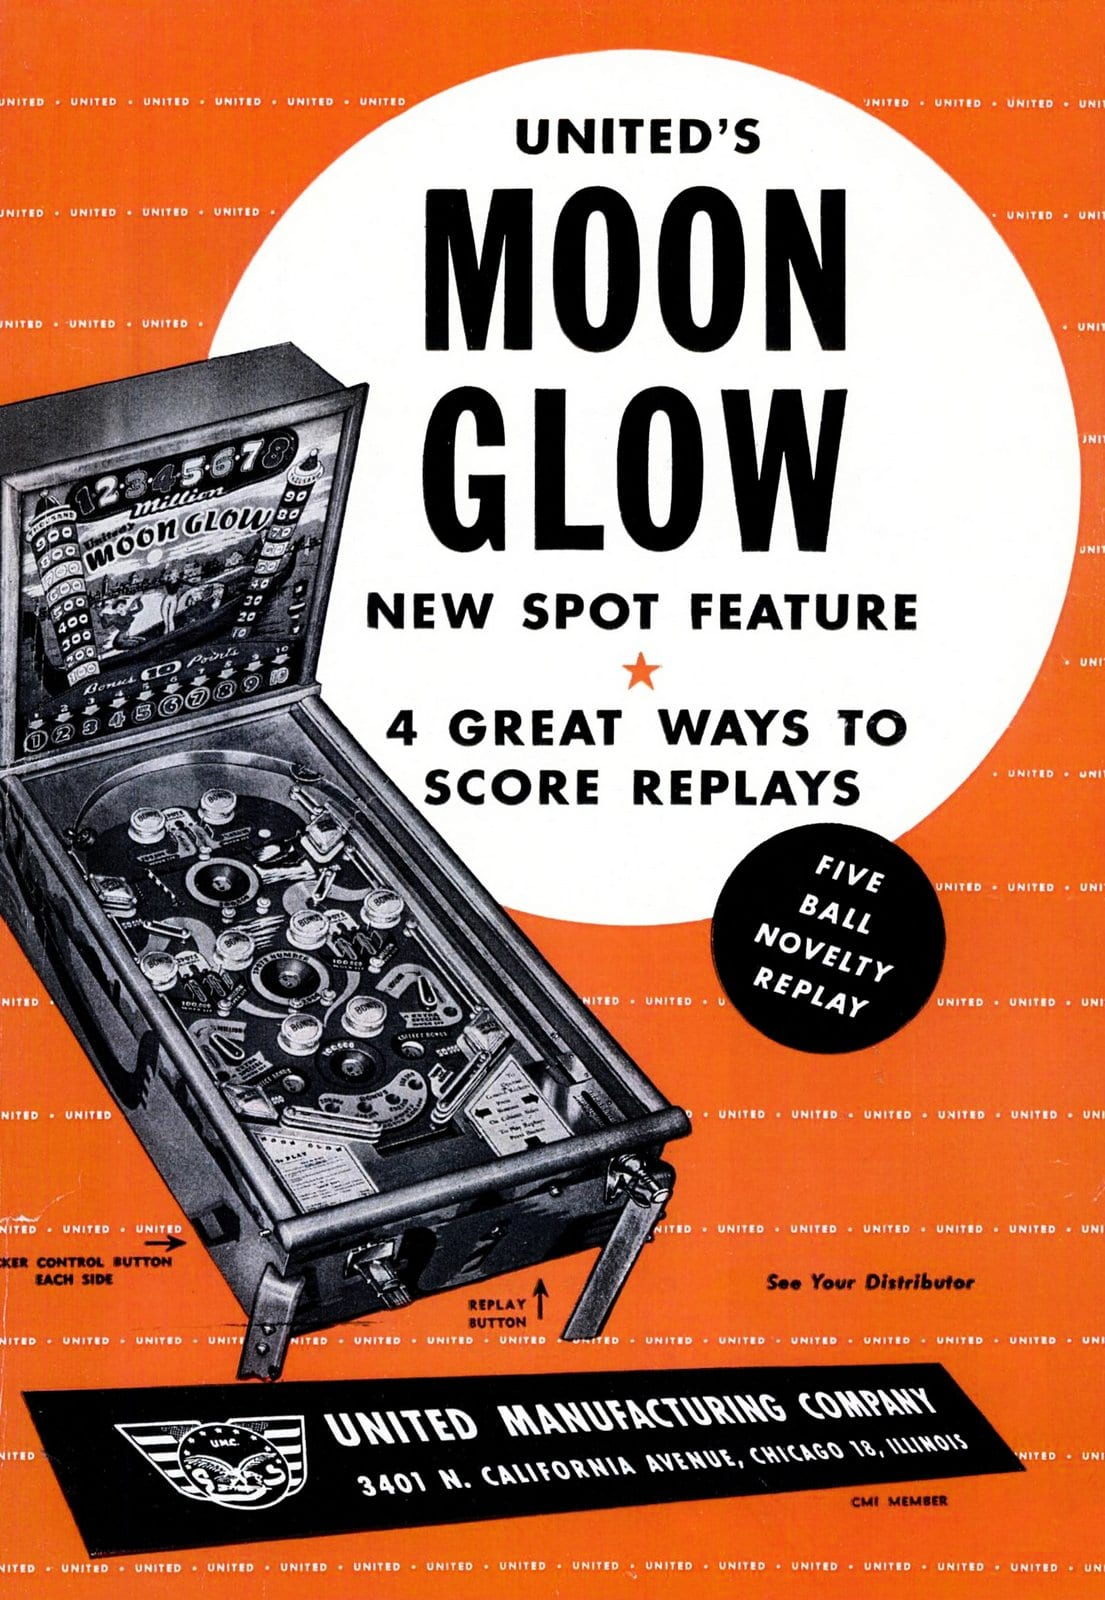 Moon Glow pinball game - Billboard Dec 11, 1948